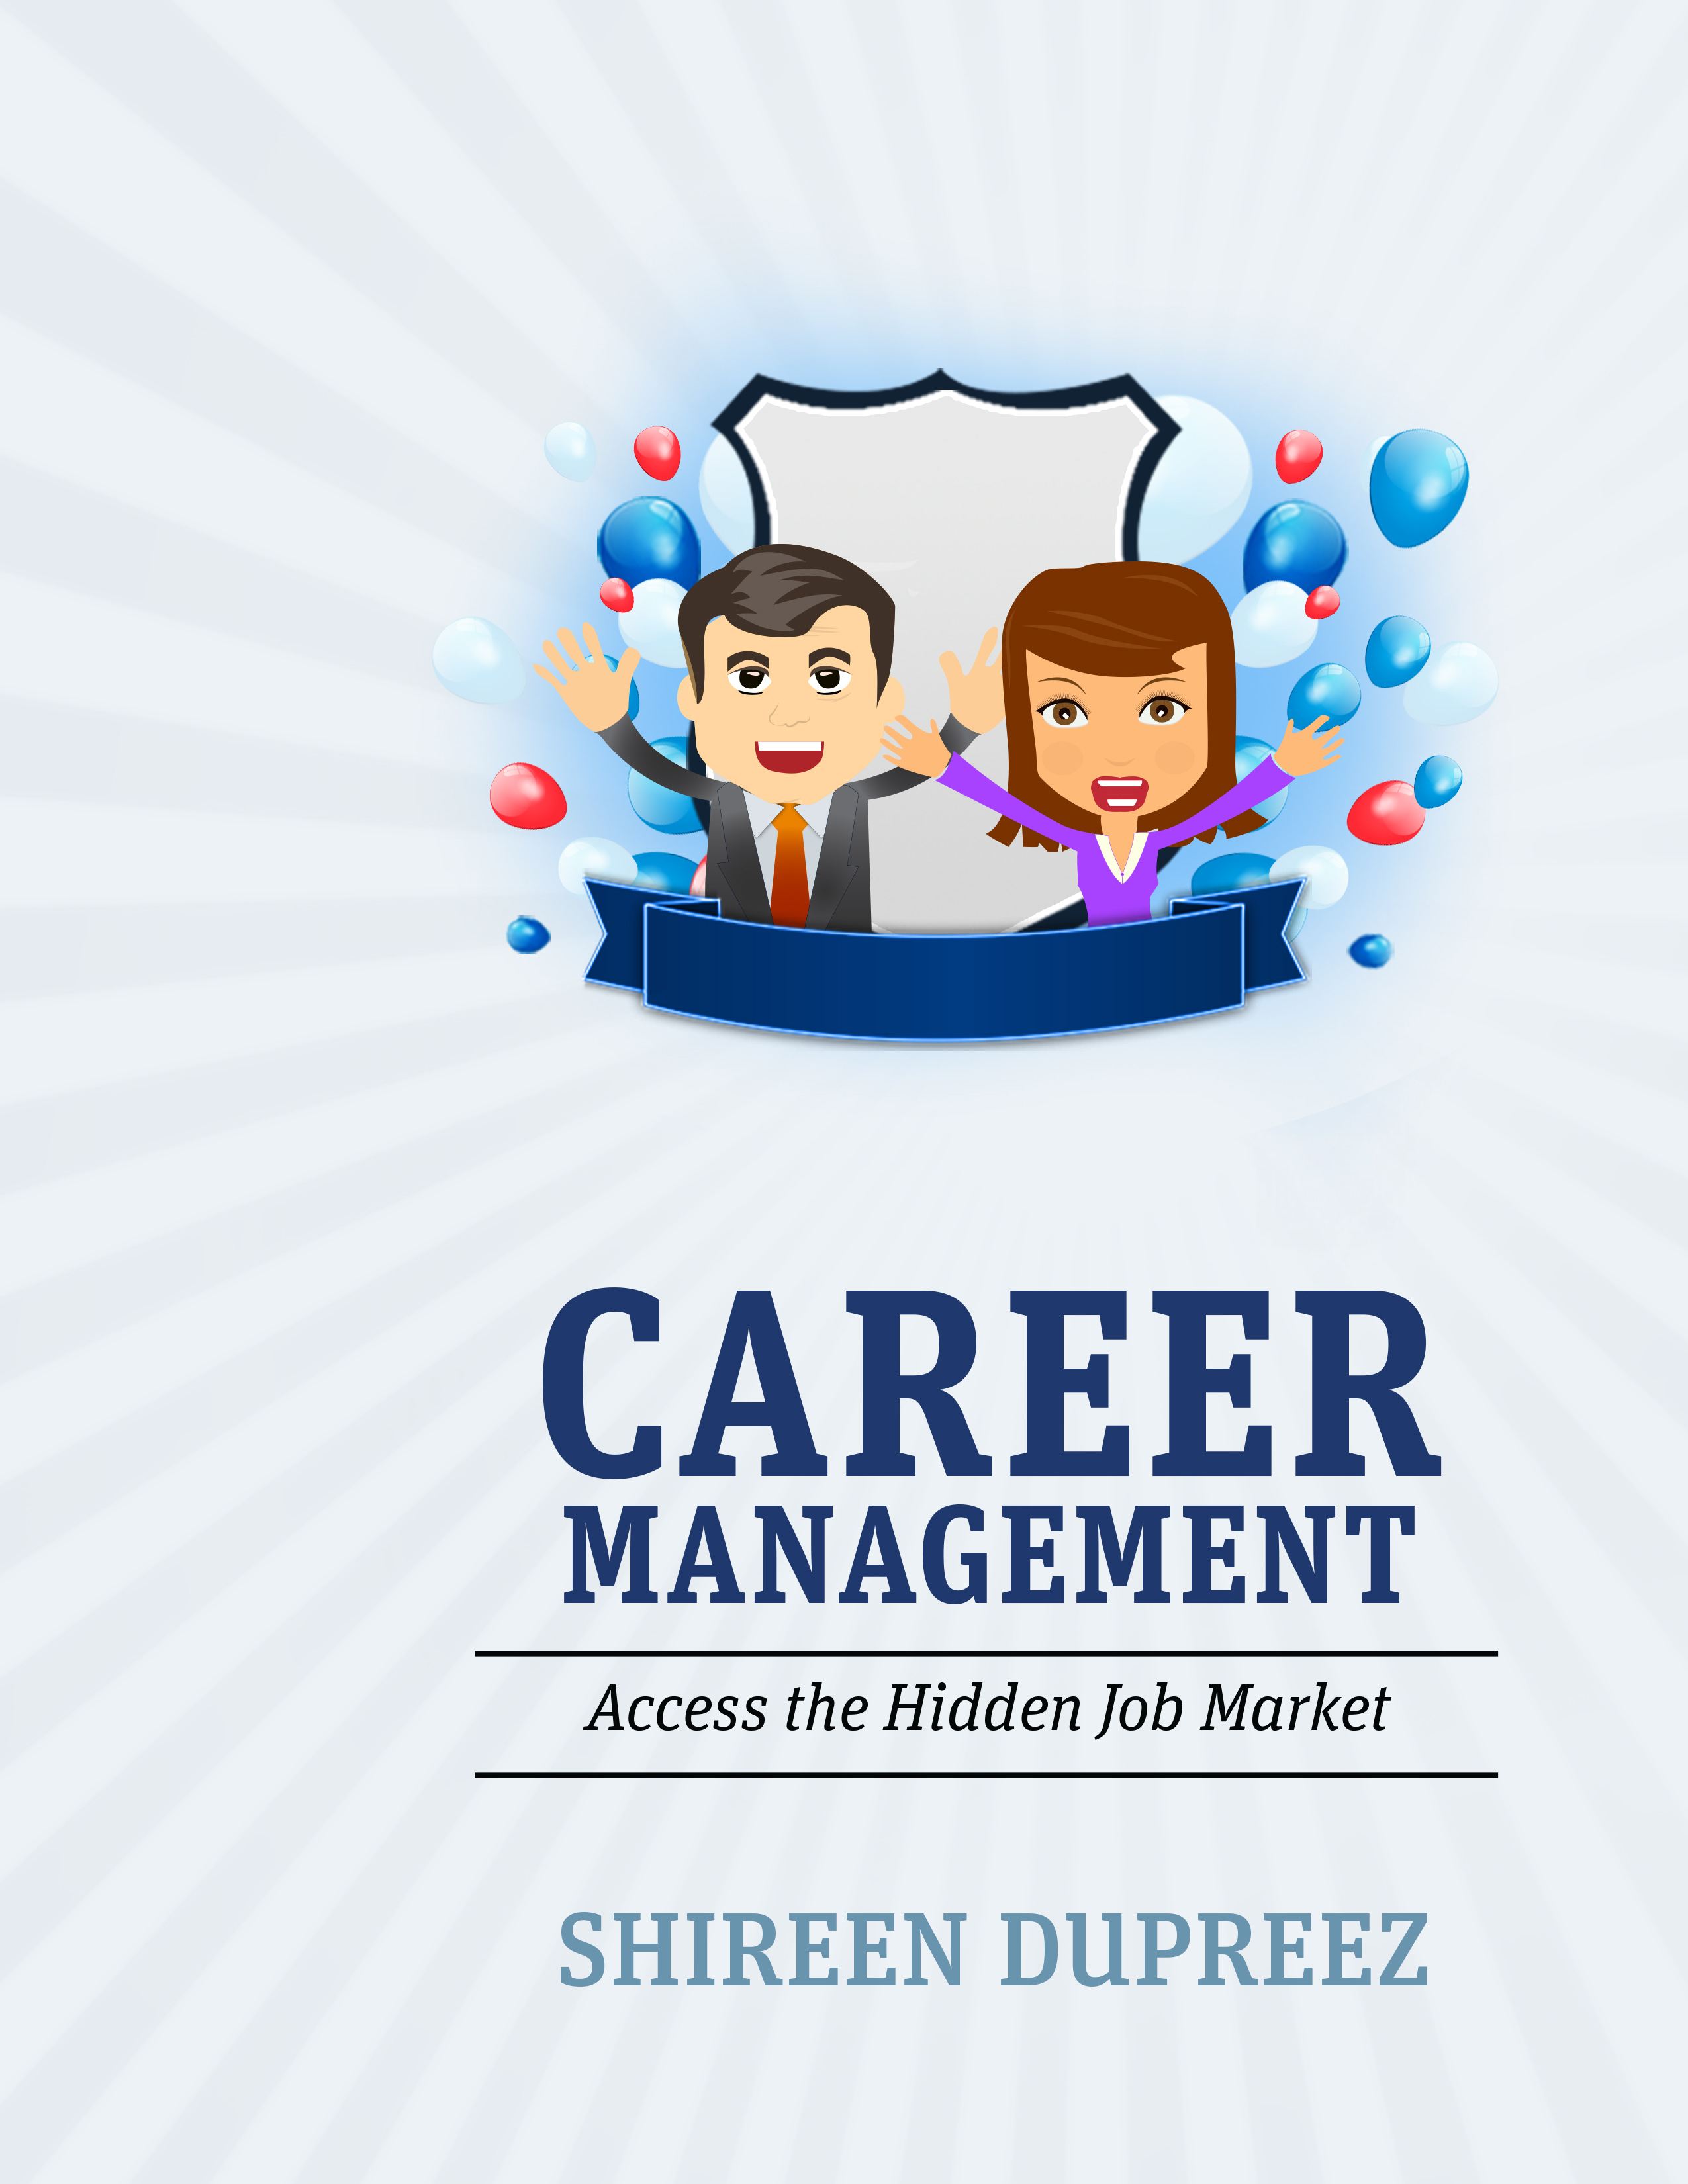 Top 20 | Top Executive Search Firms